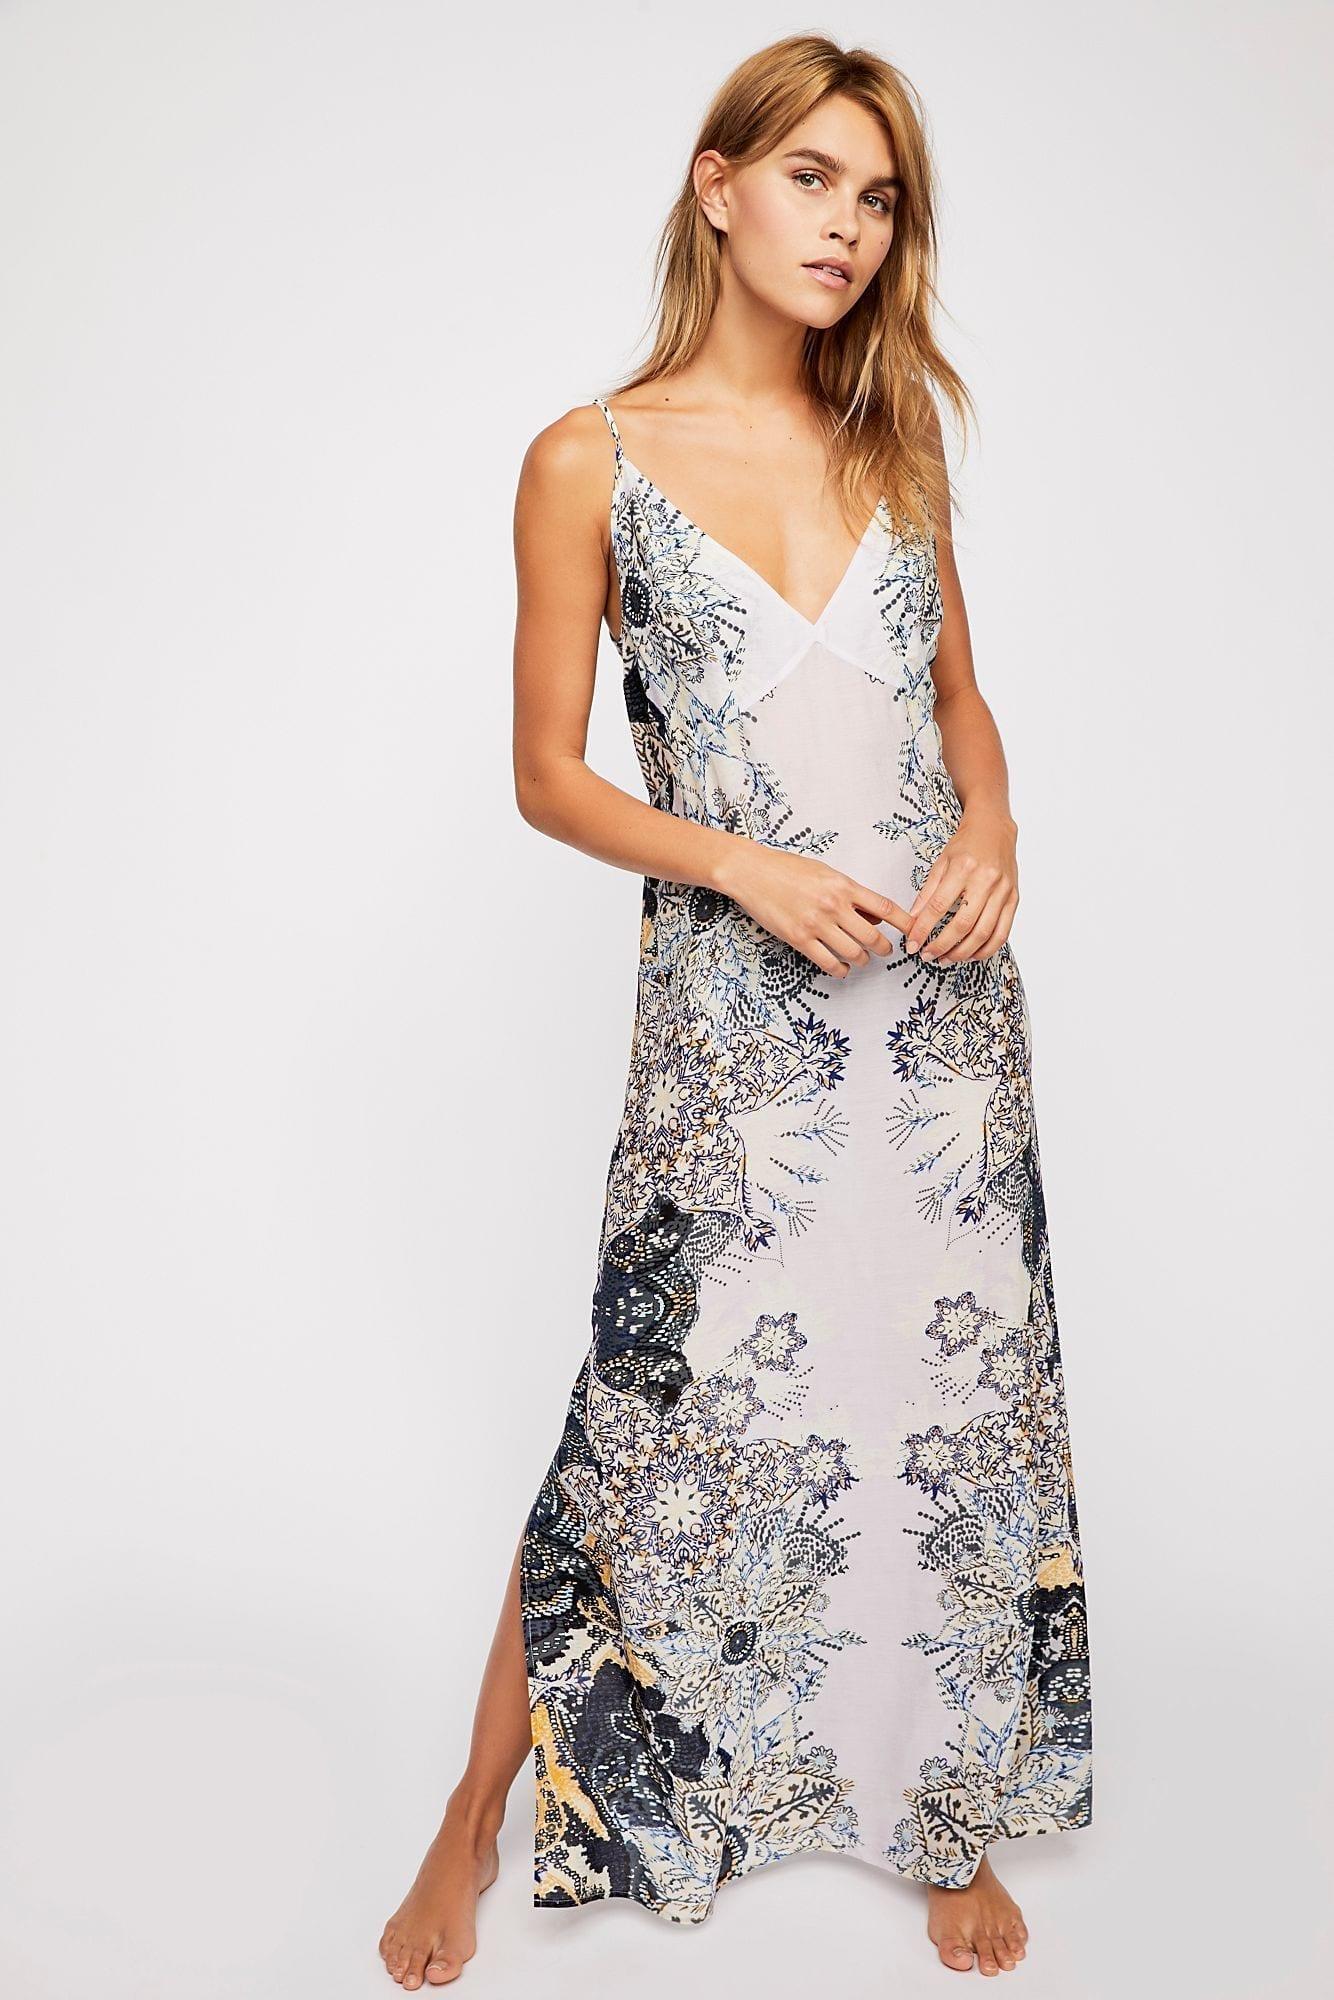 INTIMATELY Wildflower Printed Slip Lilac Dress